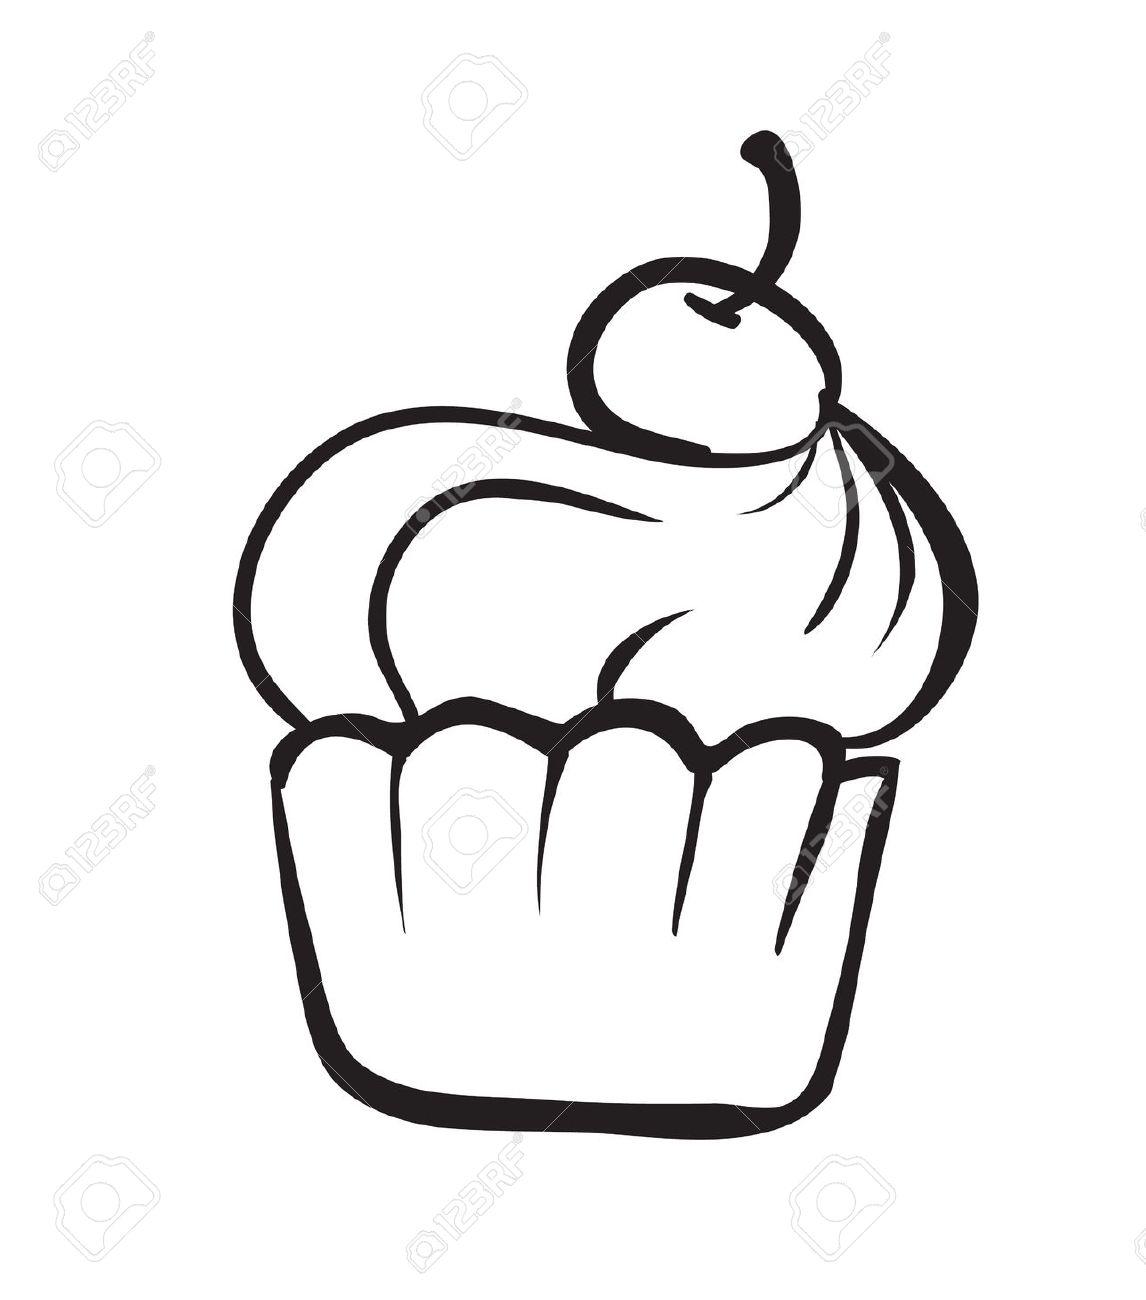 Dessert black and white clipart svg black and white stock Black And White Dessert Clipart | Free download best Black And White ... svg black and white stock